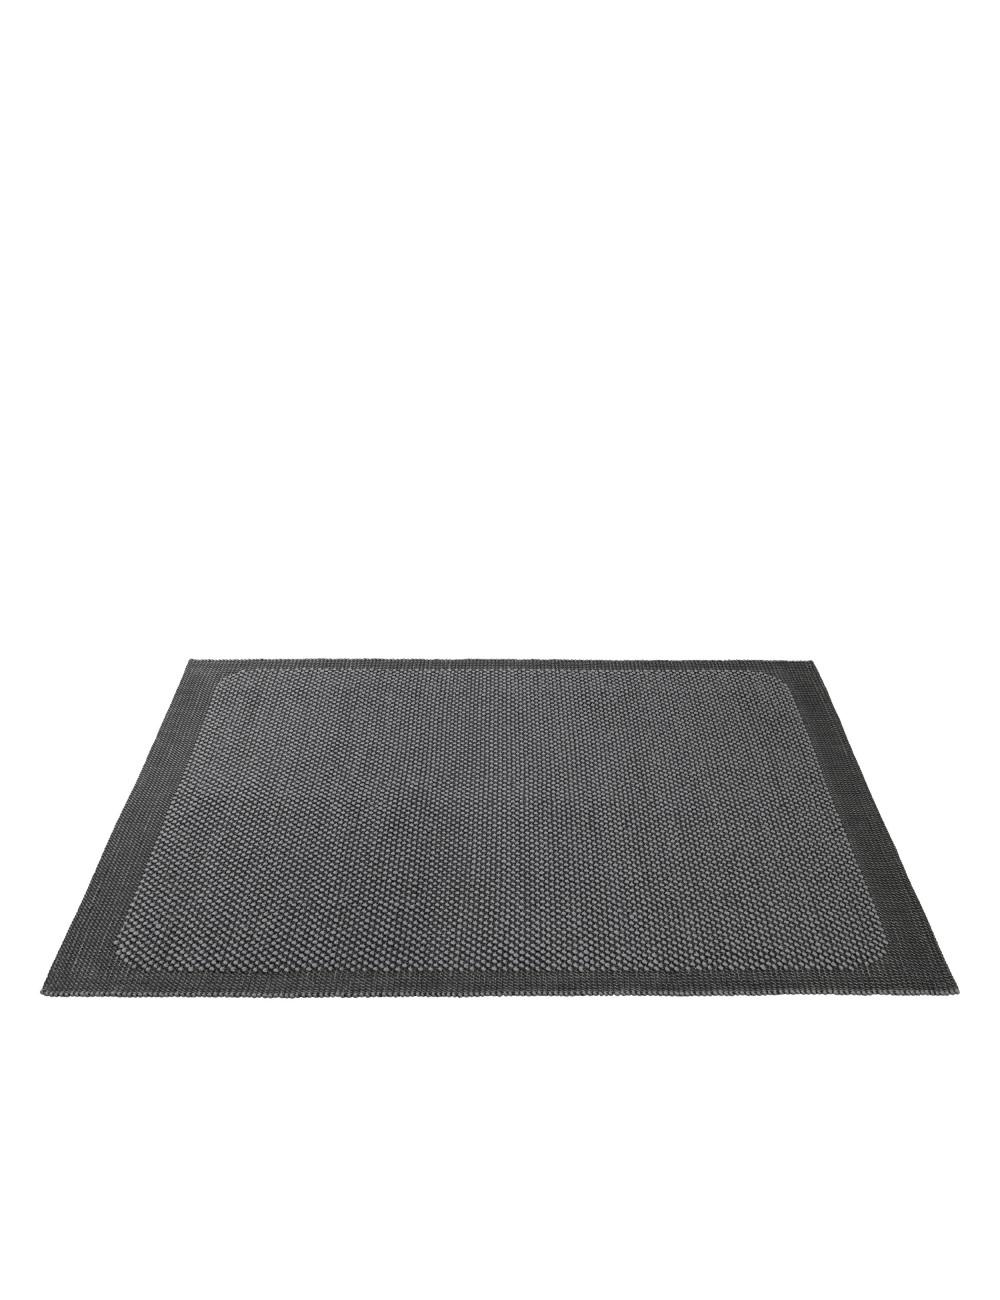 Tapijt Pebble 300x200cm | donker grijs